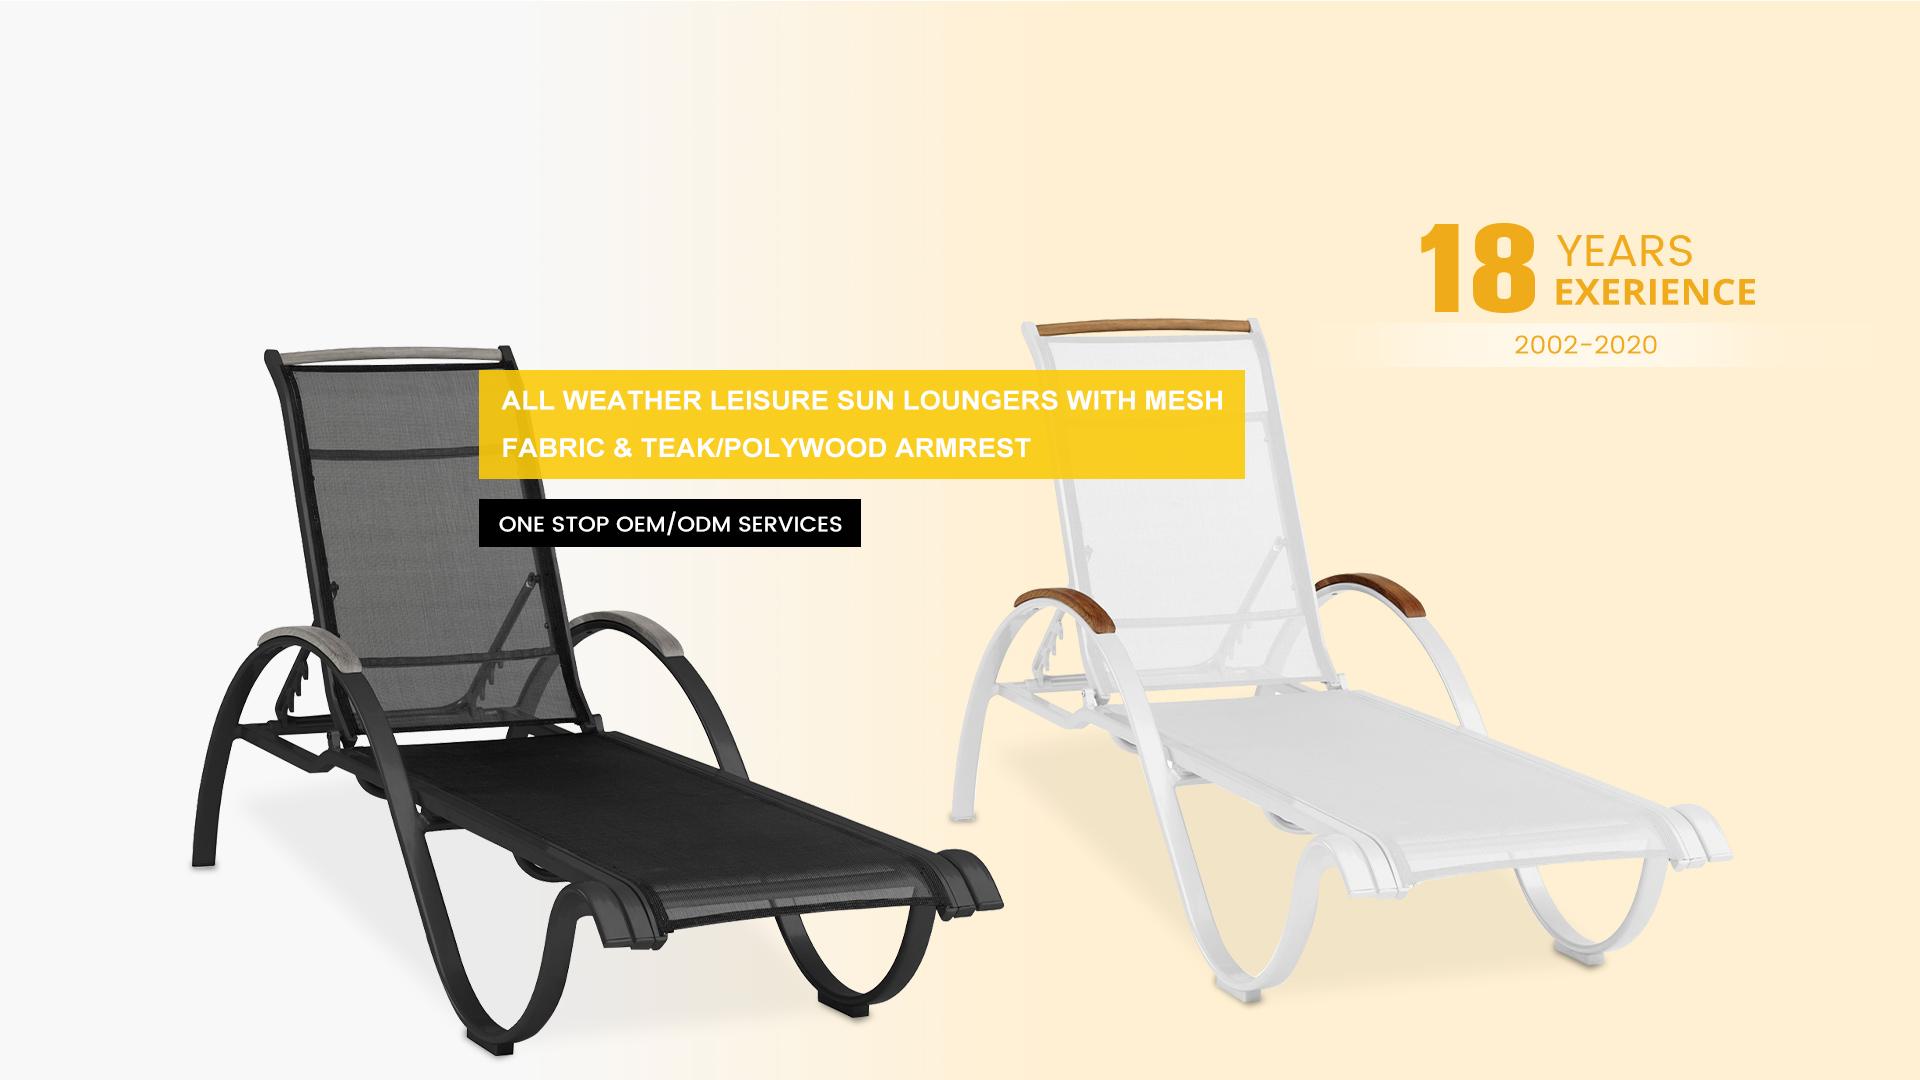 Foshan Kingsland Smart Outdoor Products Co., Ltd.